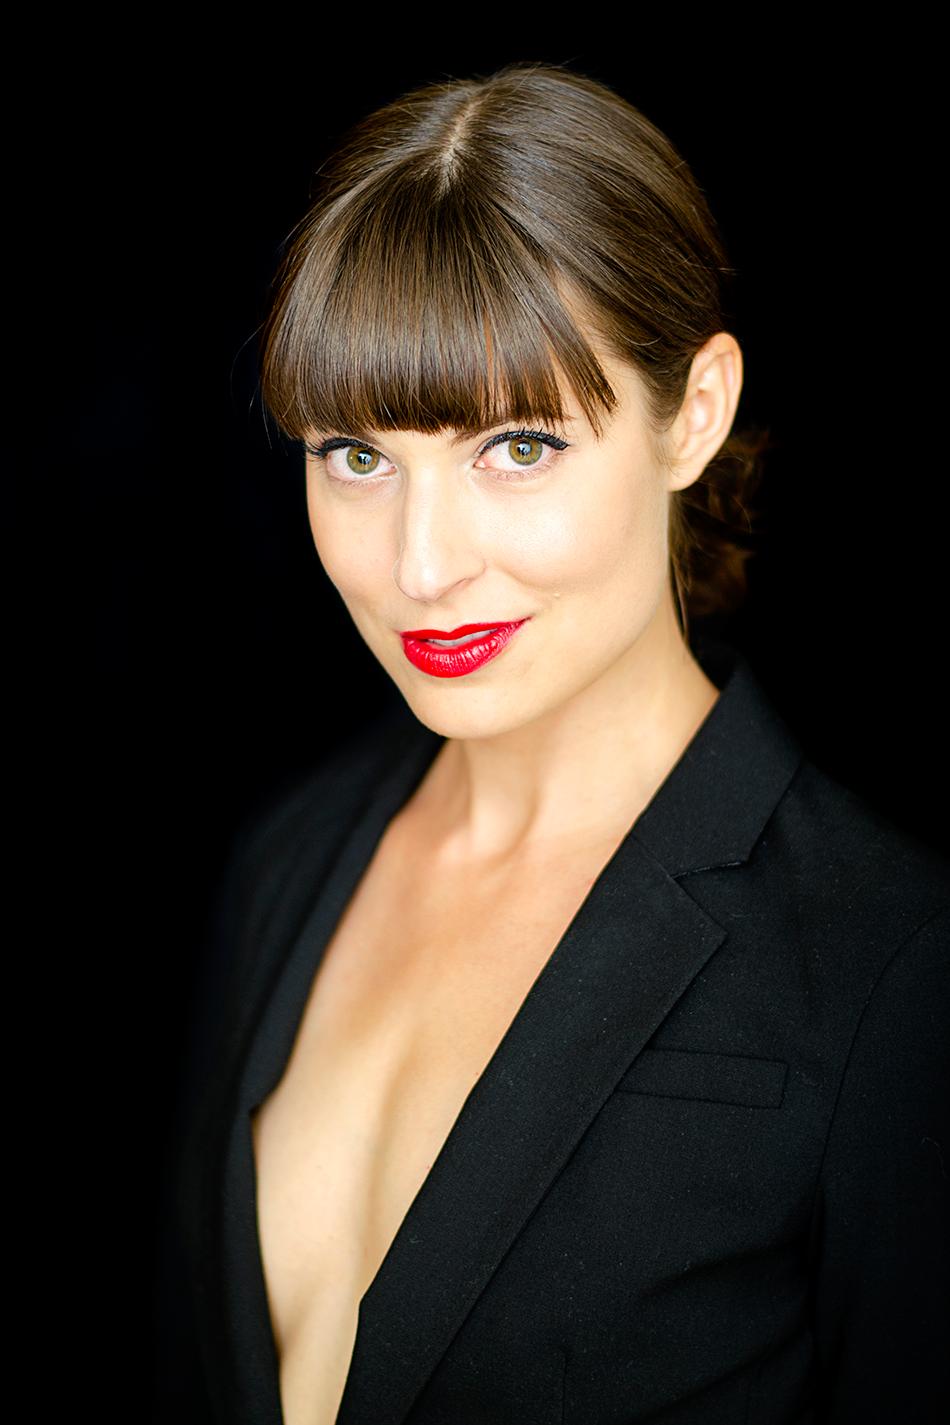 Talia Montgomery